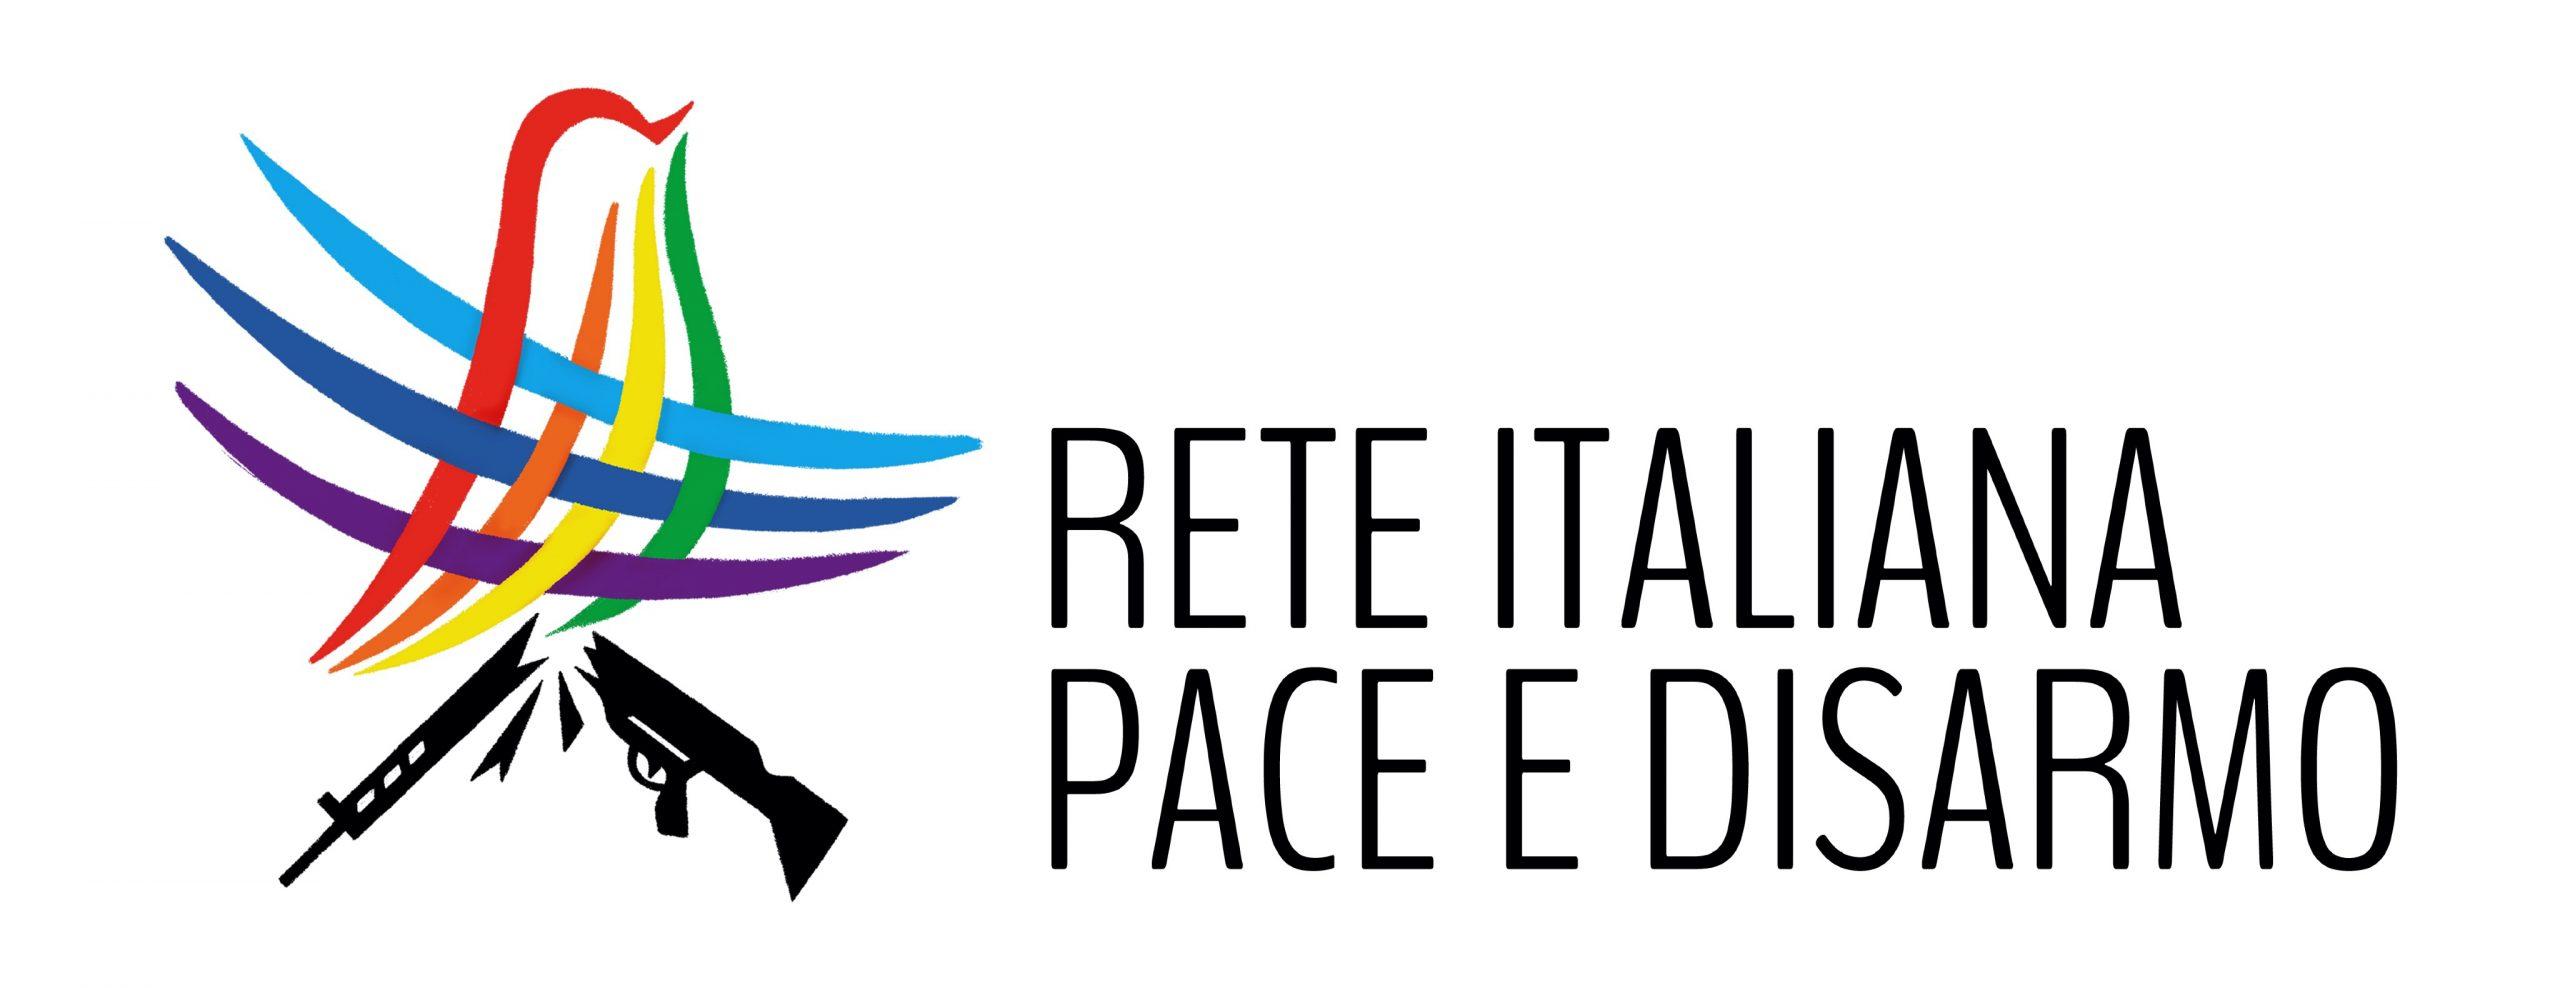 Rete Italiana Pace e Disarmo